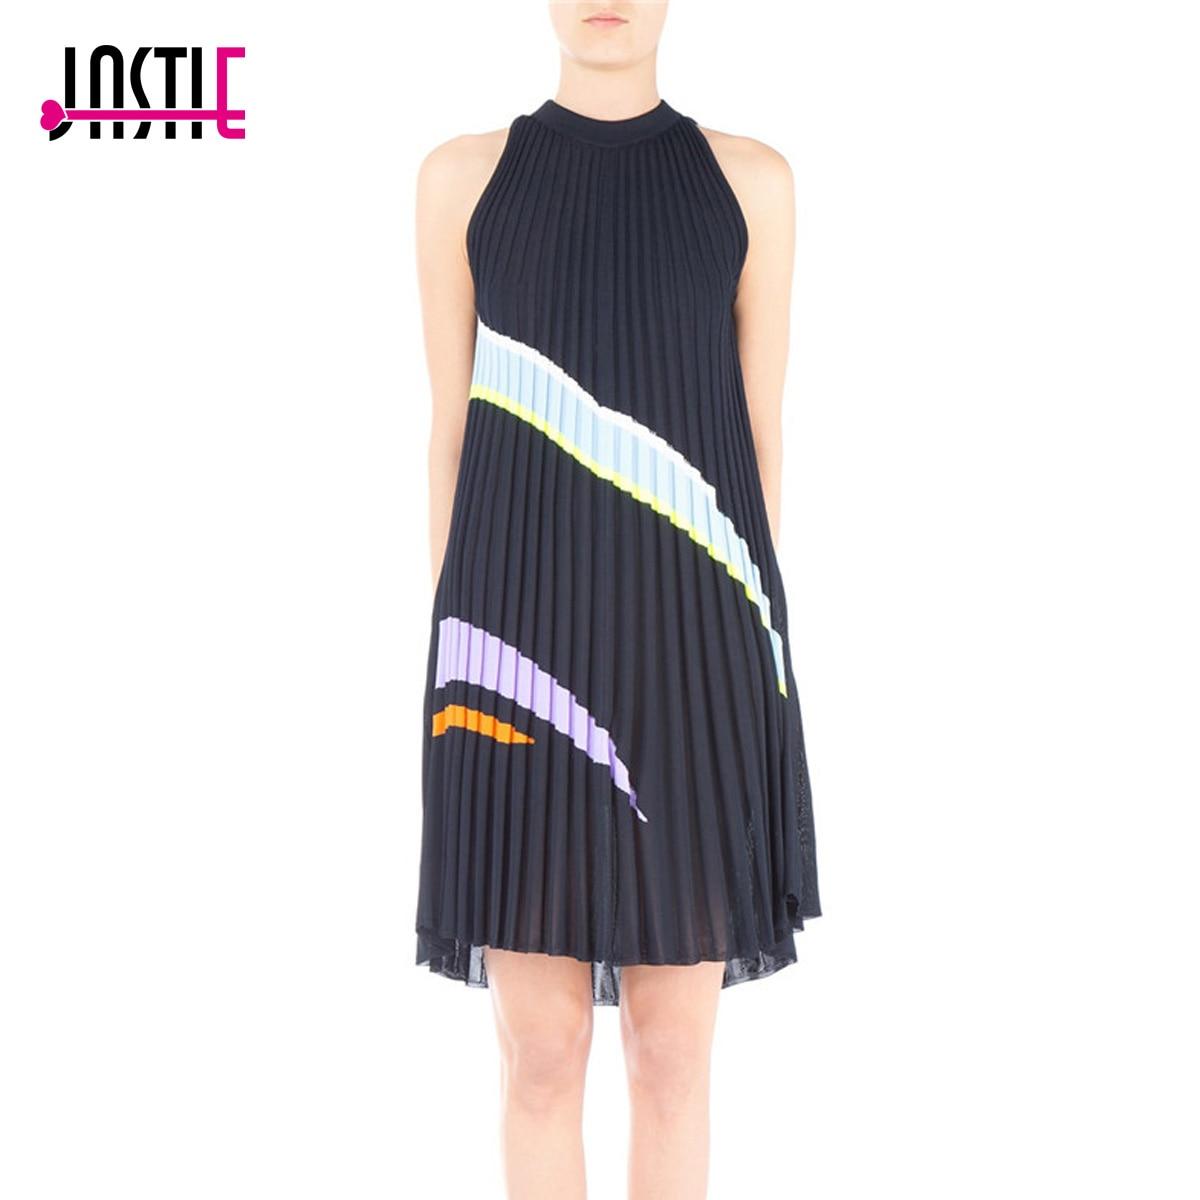 Jastie Asymmetric Color Striped Knitted Pleated Dress O-Neck Sleeveless Midi Dresses Bodycon Autumn Winter Dress Women VestidosÎäåæäà è àêñåññóàðû<br><br>